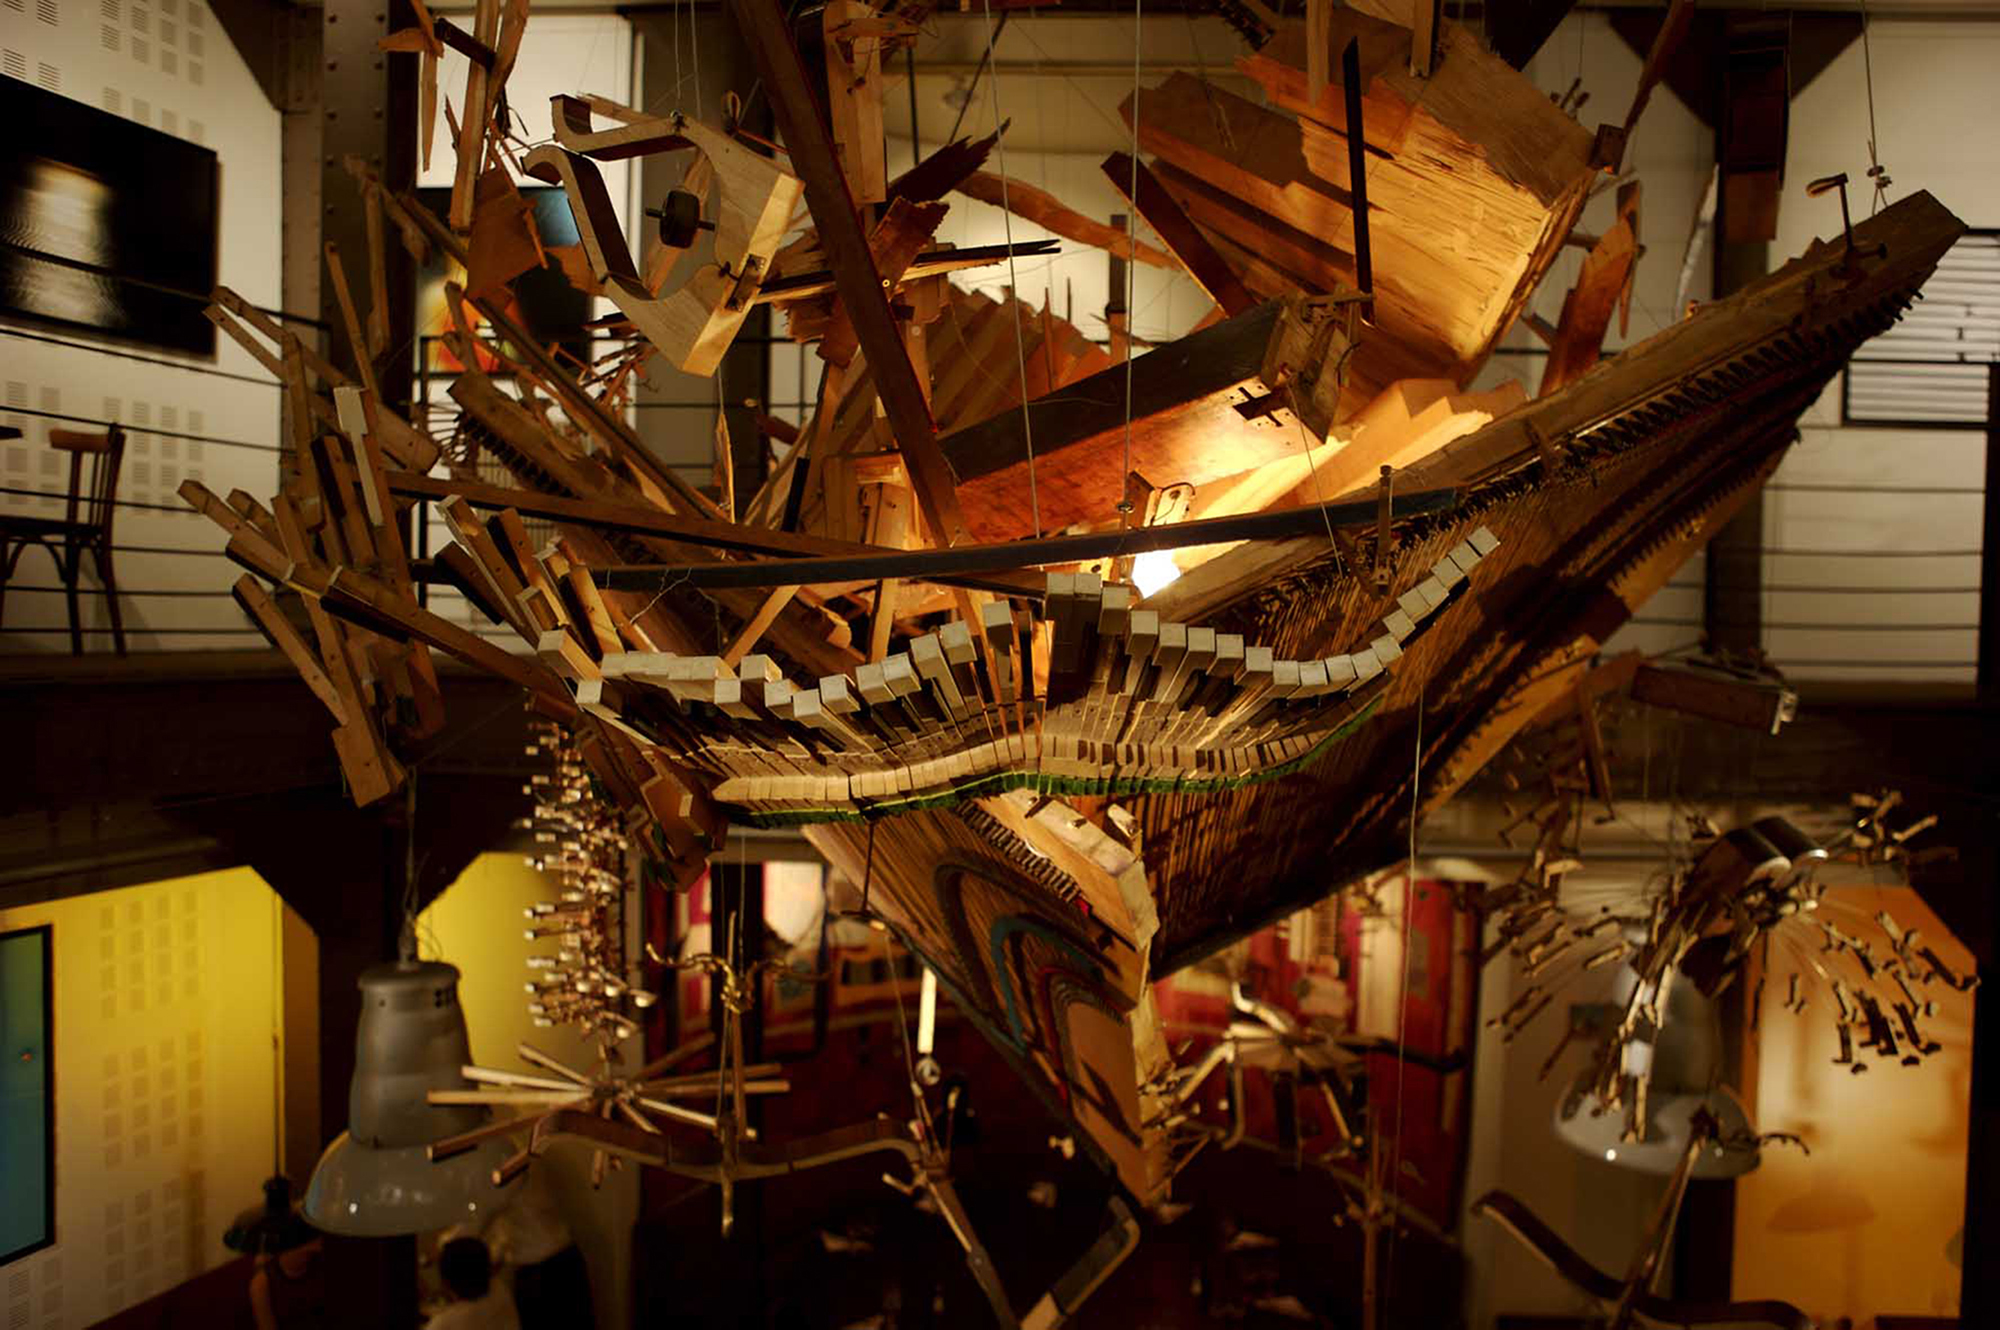 (7)NicolasHenry_ExplosionDePiano2_RestaurantChezGuillaume_Paris.jpg